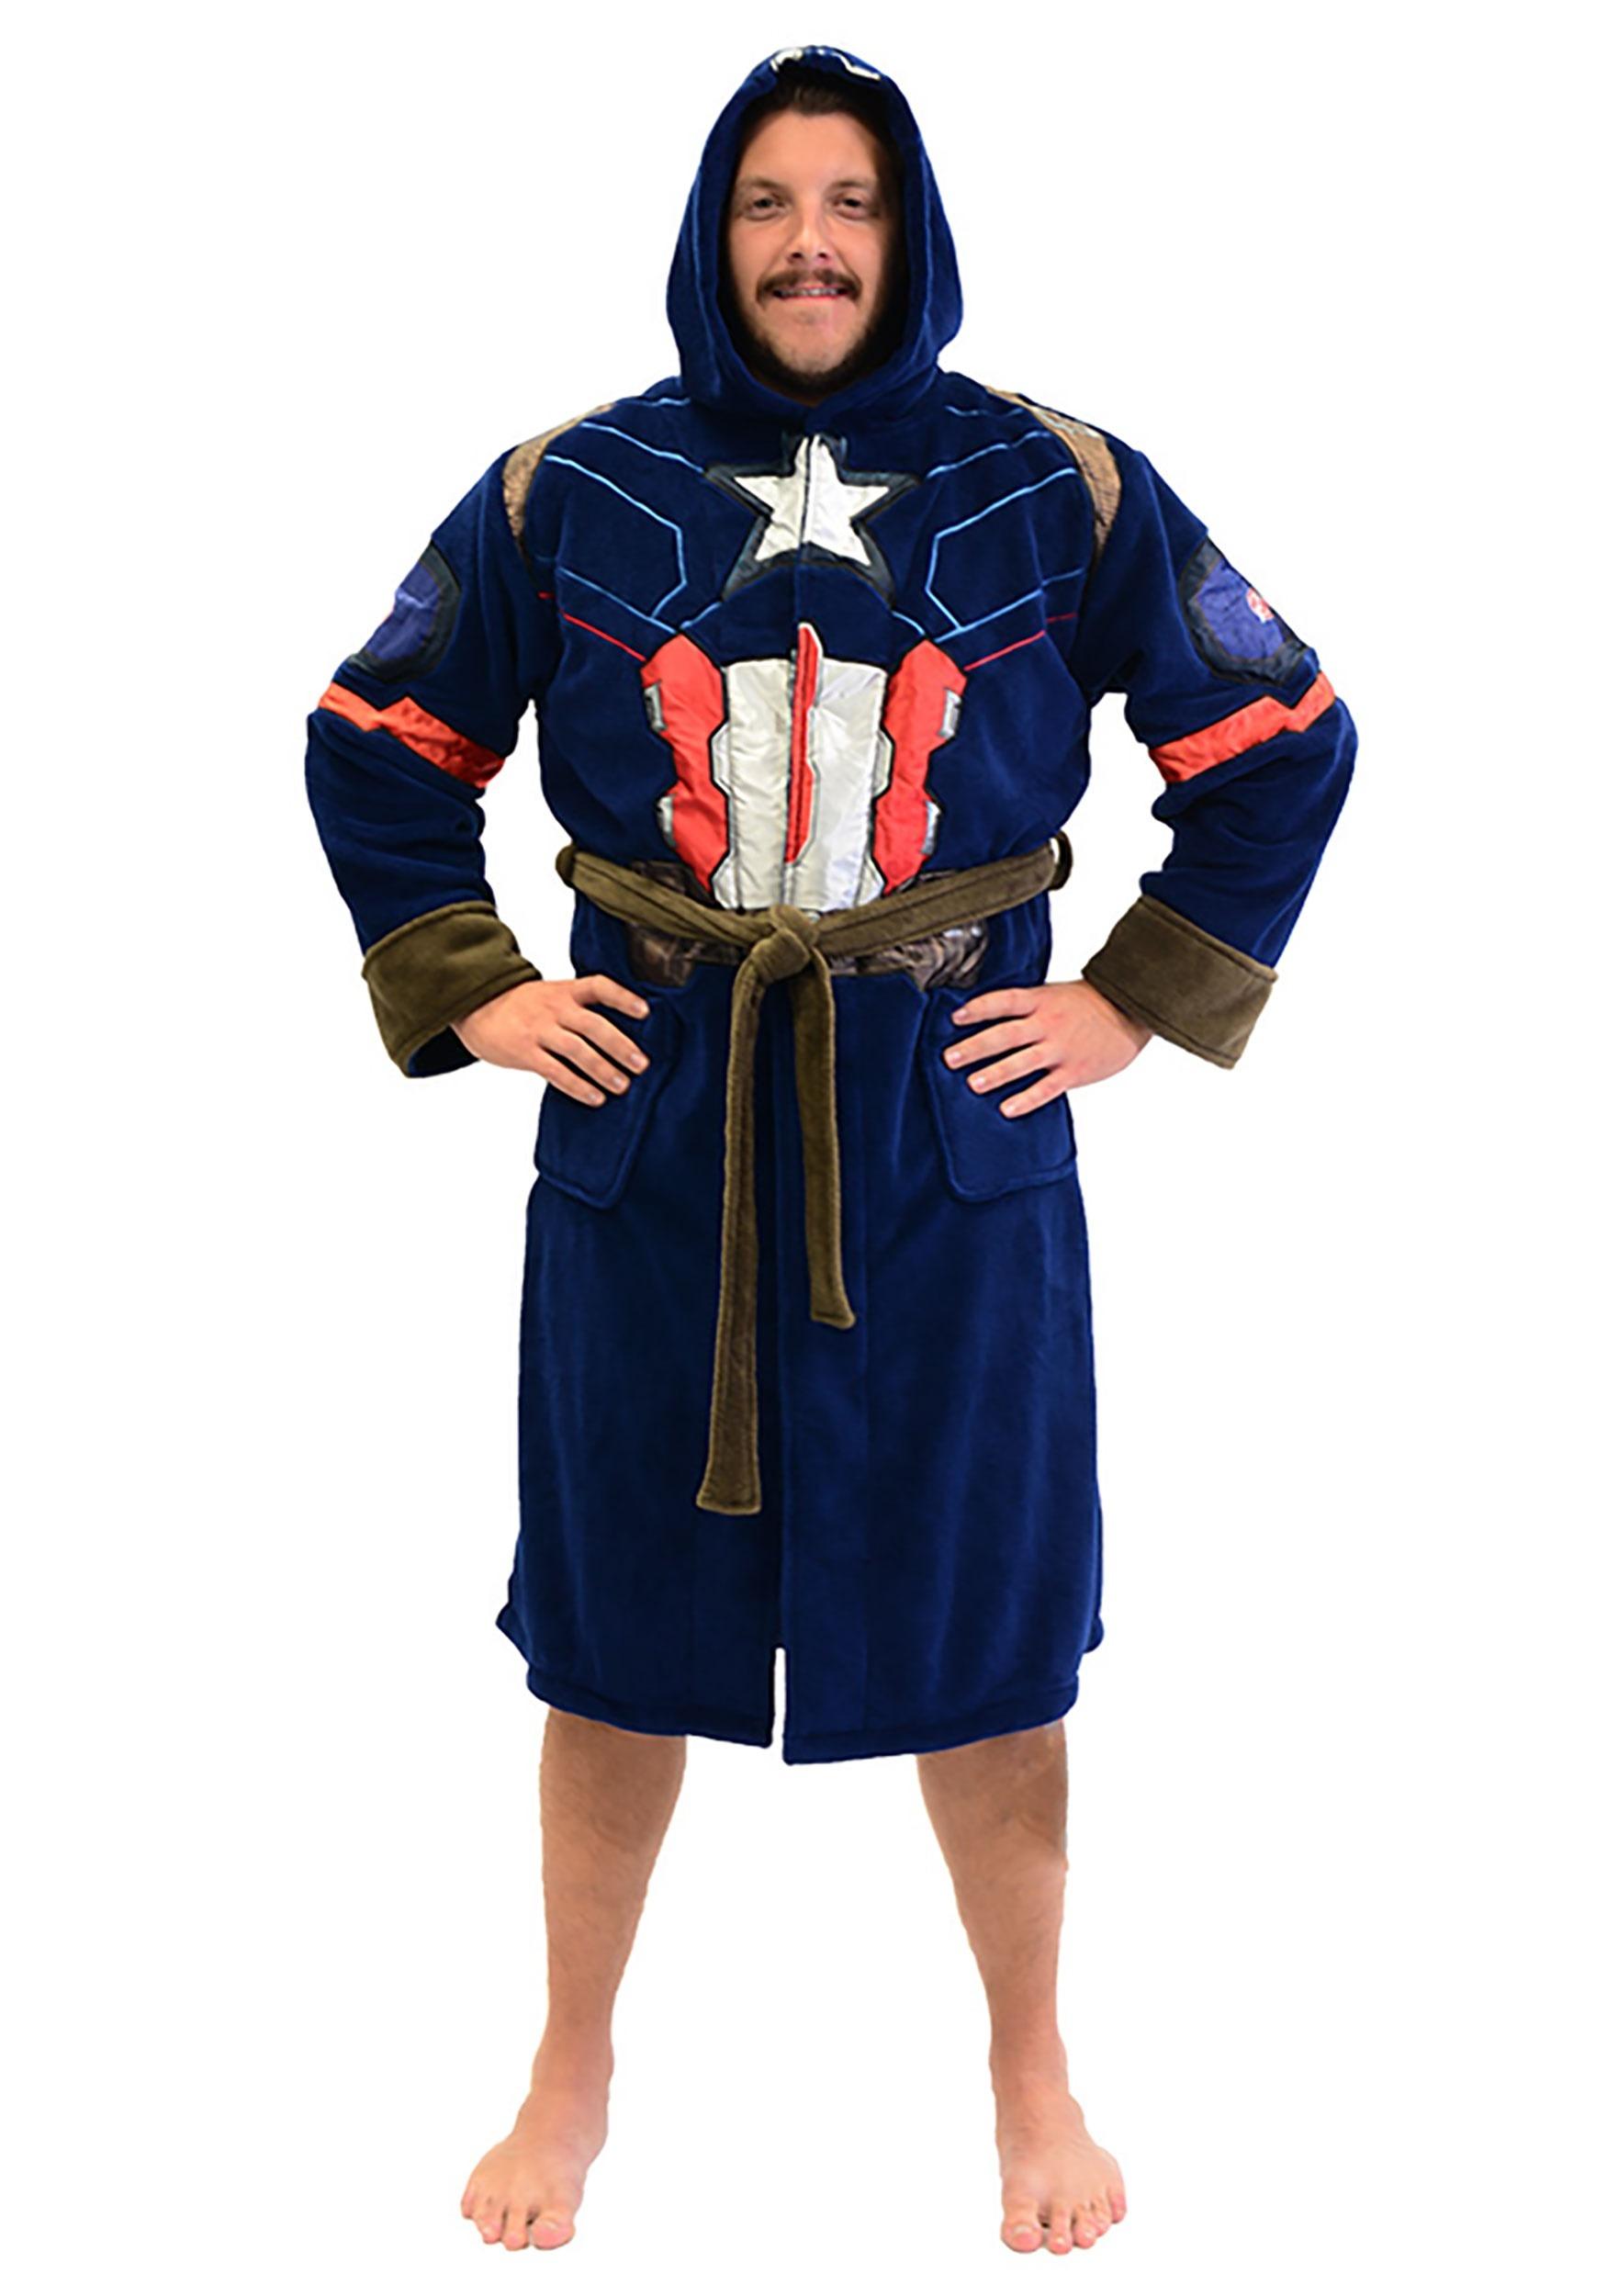 Captain America Adult Fleece Robe  sc 1 st  Fun.com & Captain America Fleece Robe for Adults